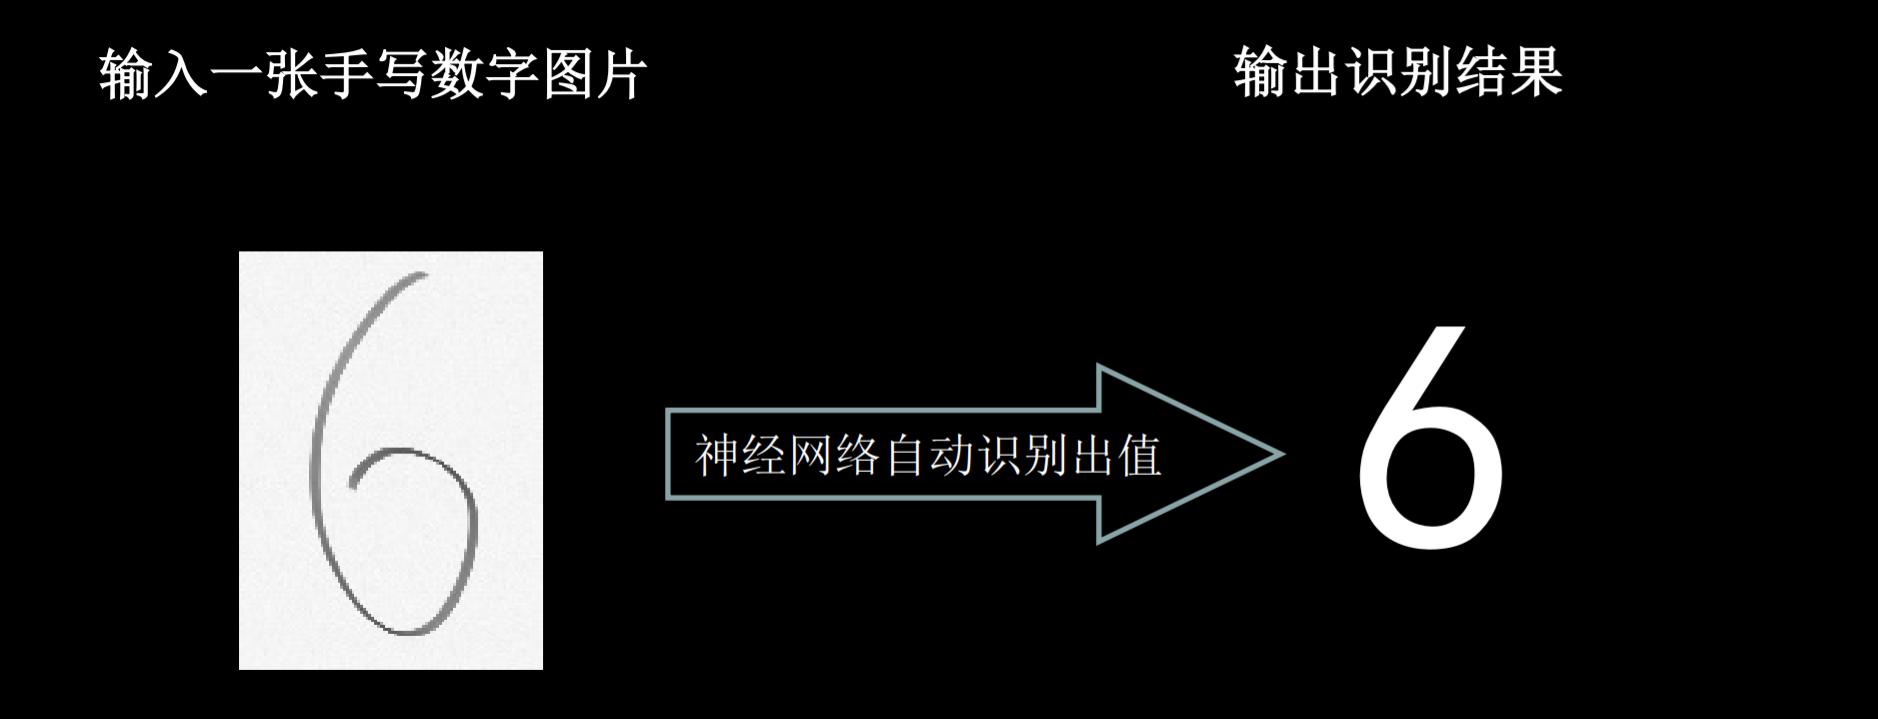 TensorFlow2.1入门学习笔记(11)——自制数据集,并记录训练模型